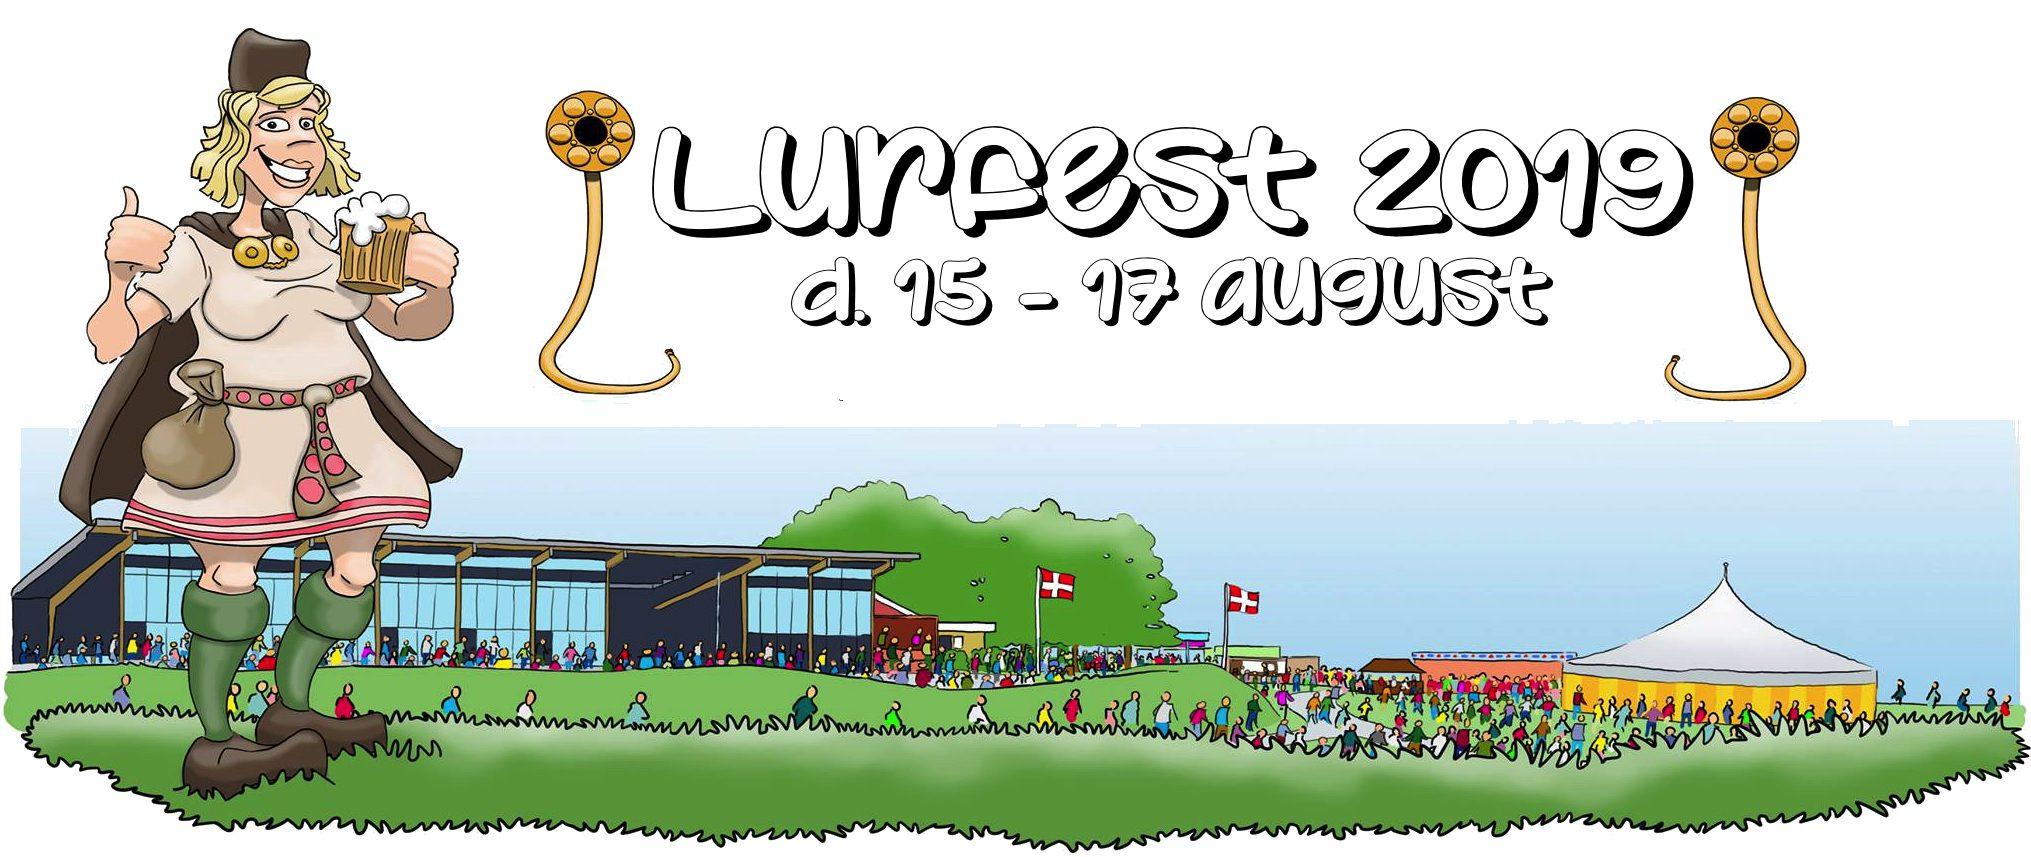 Lurfesten 2019